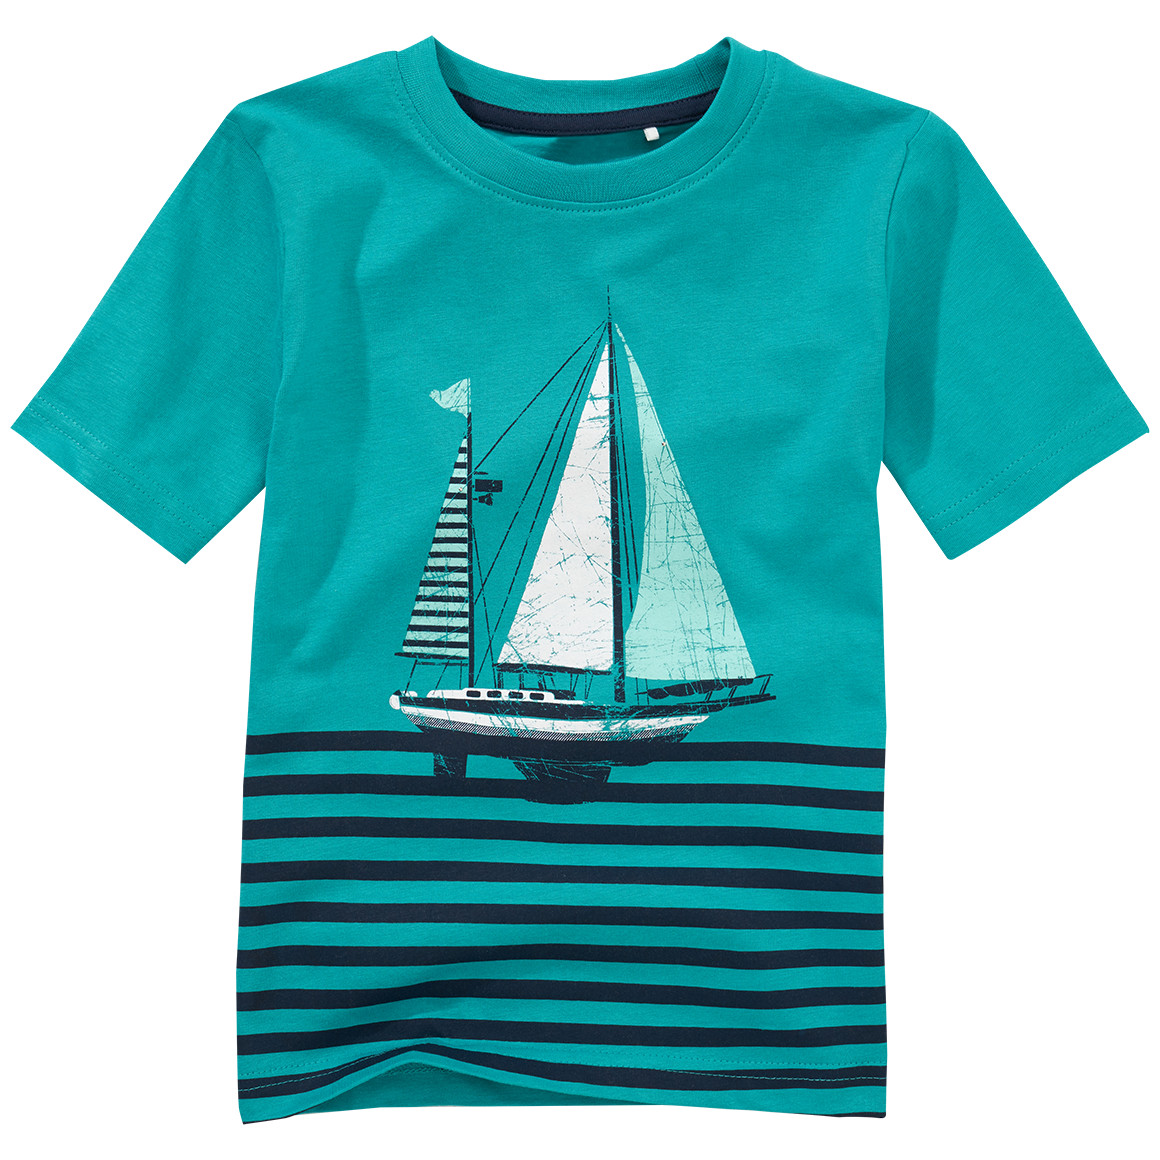 Jungen T-Shirt mit Segelschiff Print